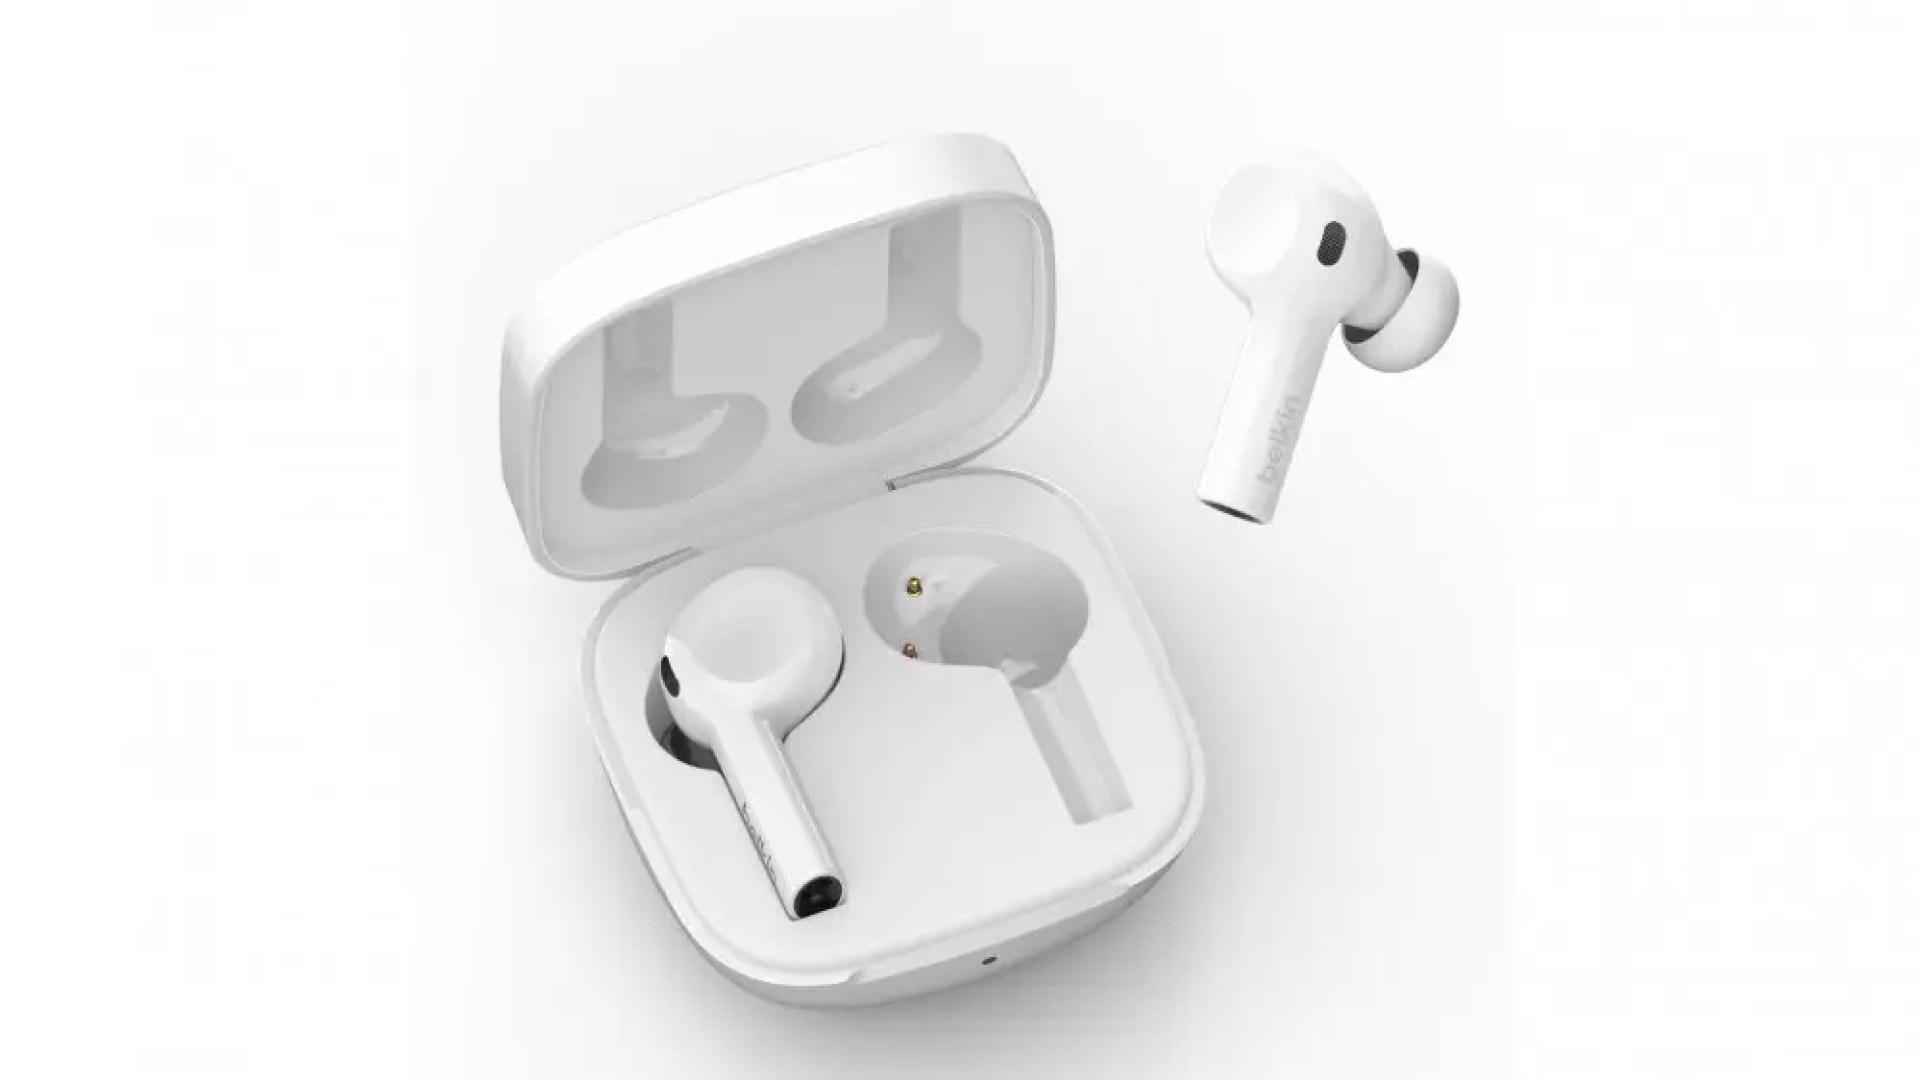 A photo of the Belkin Soundform Freedom wireless earbuds.